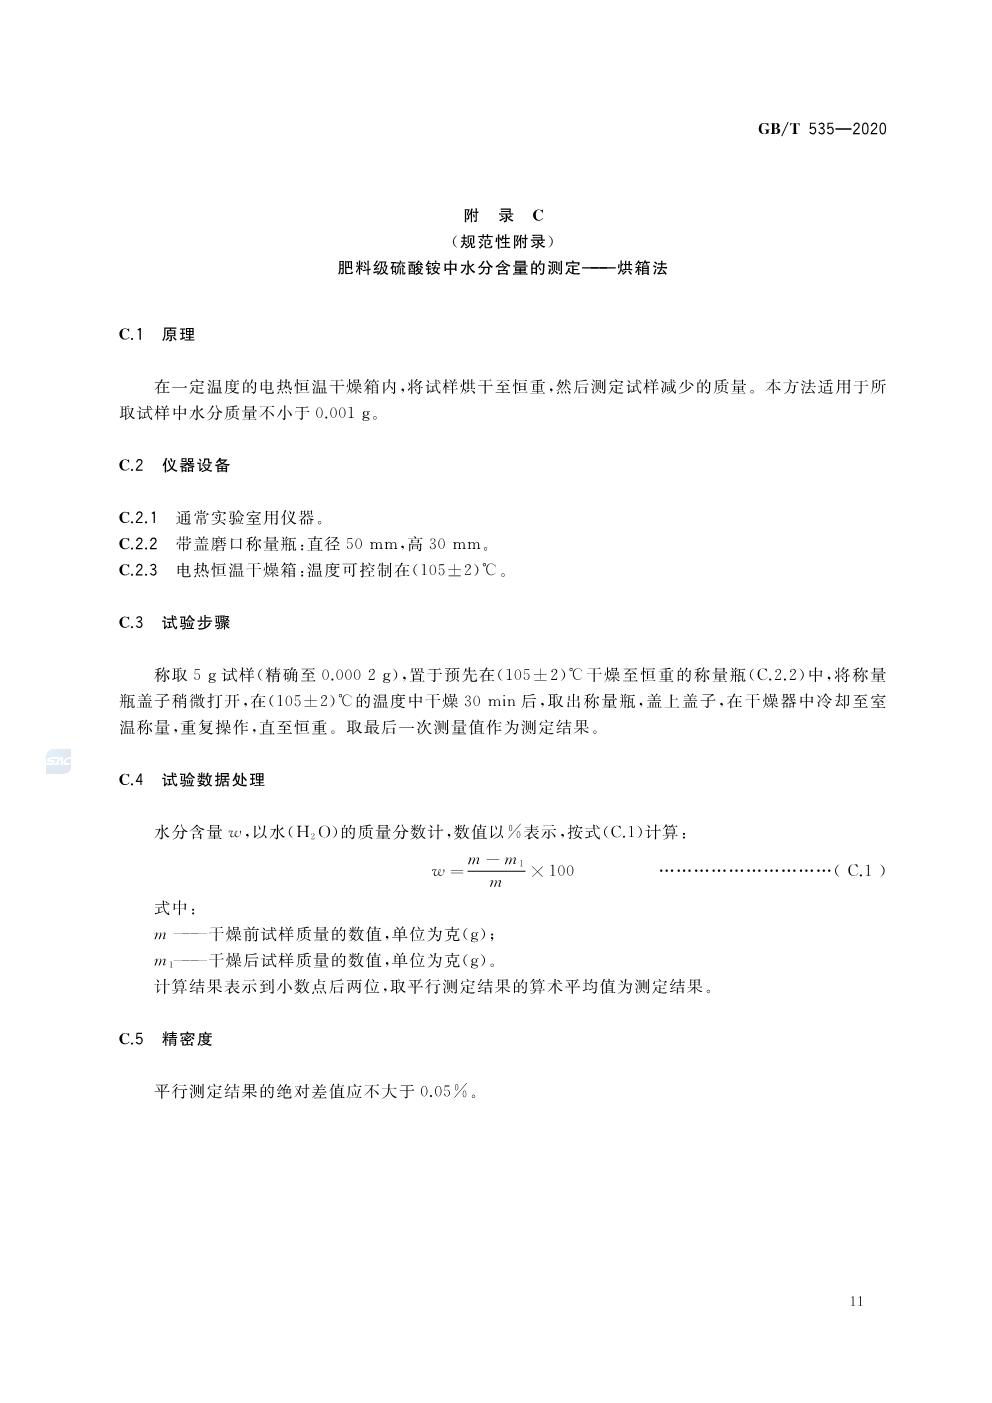 GBT535-2020肥料级硫酸铵